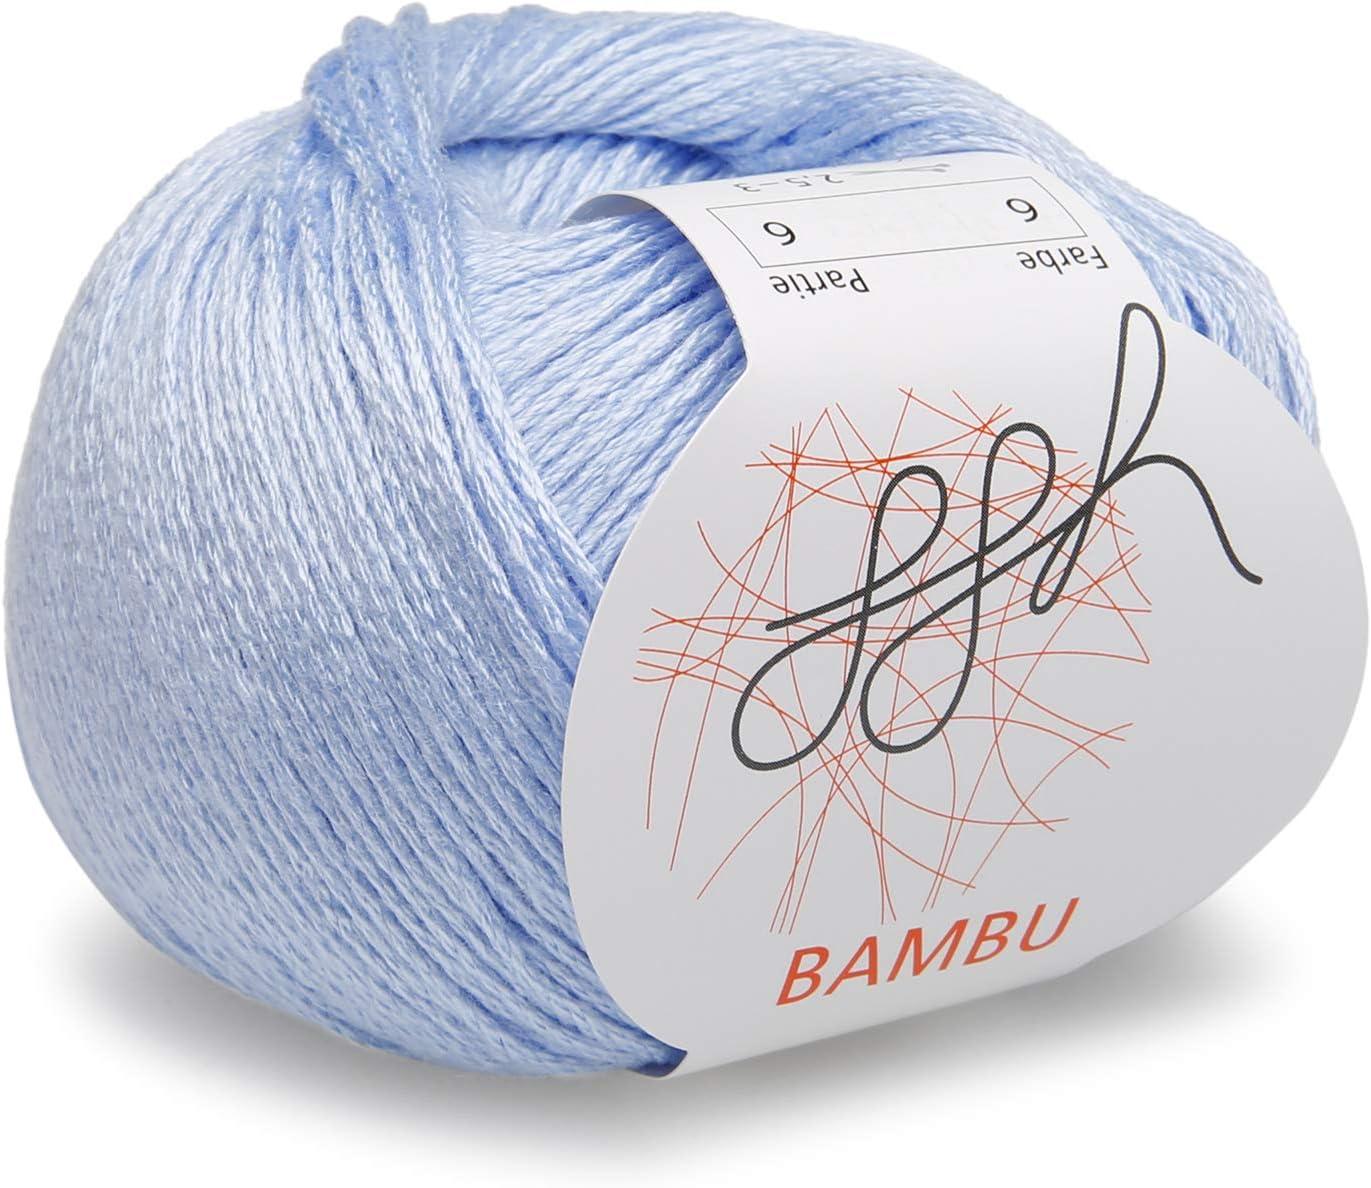 ggh Bambu - 006 - azul claro - Lana de bambú para tejer y hacer ganchillo: Amazon.es: Hogar